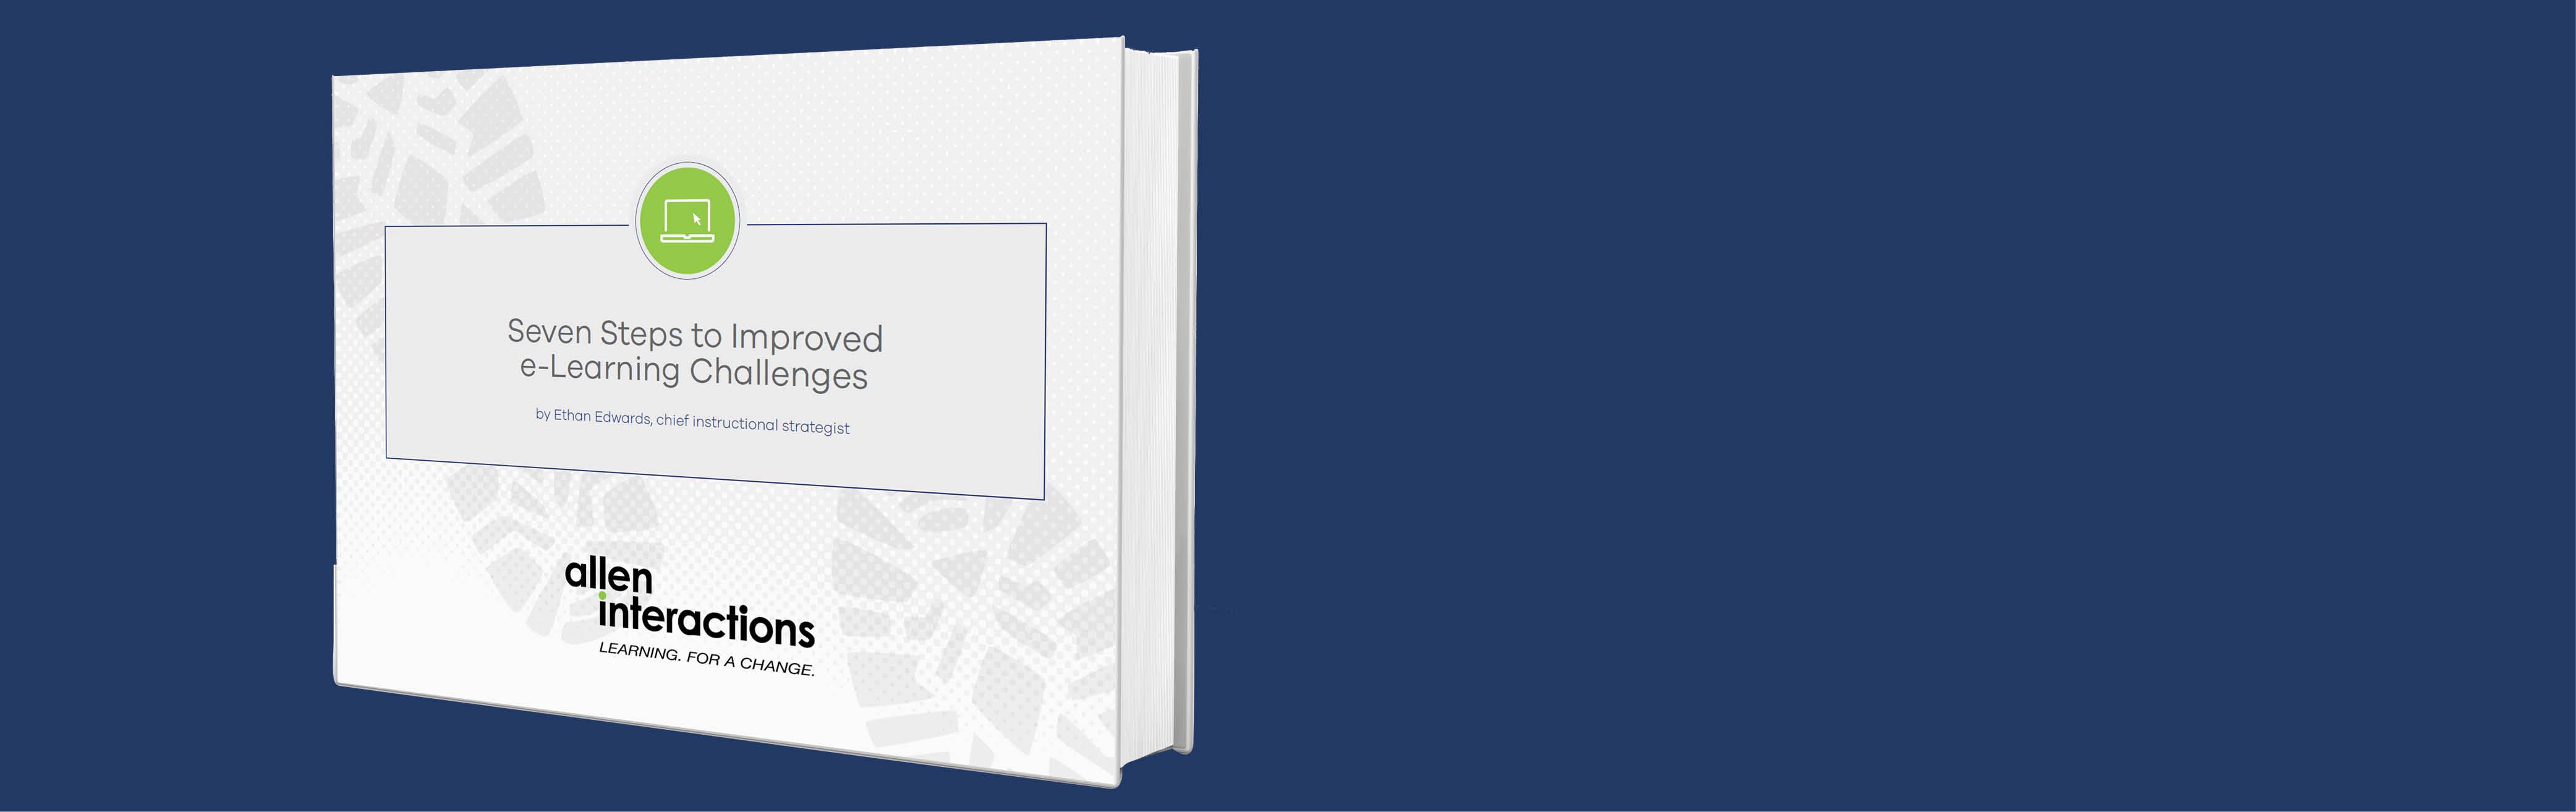 New-7-Steps-Challenges-Ebook-2015.jpg